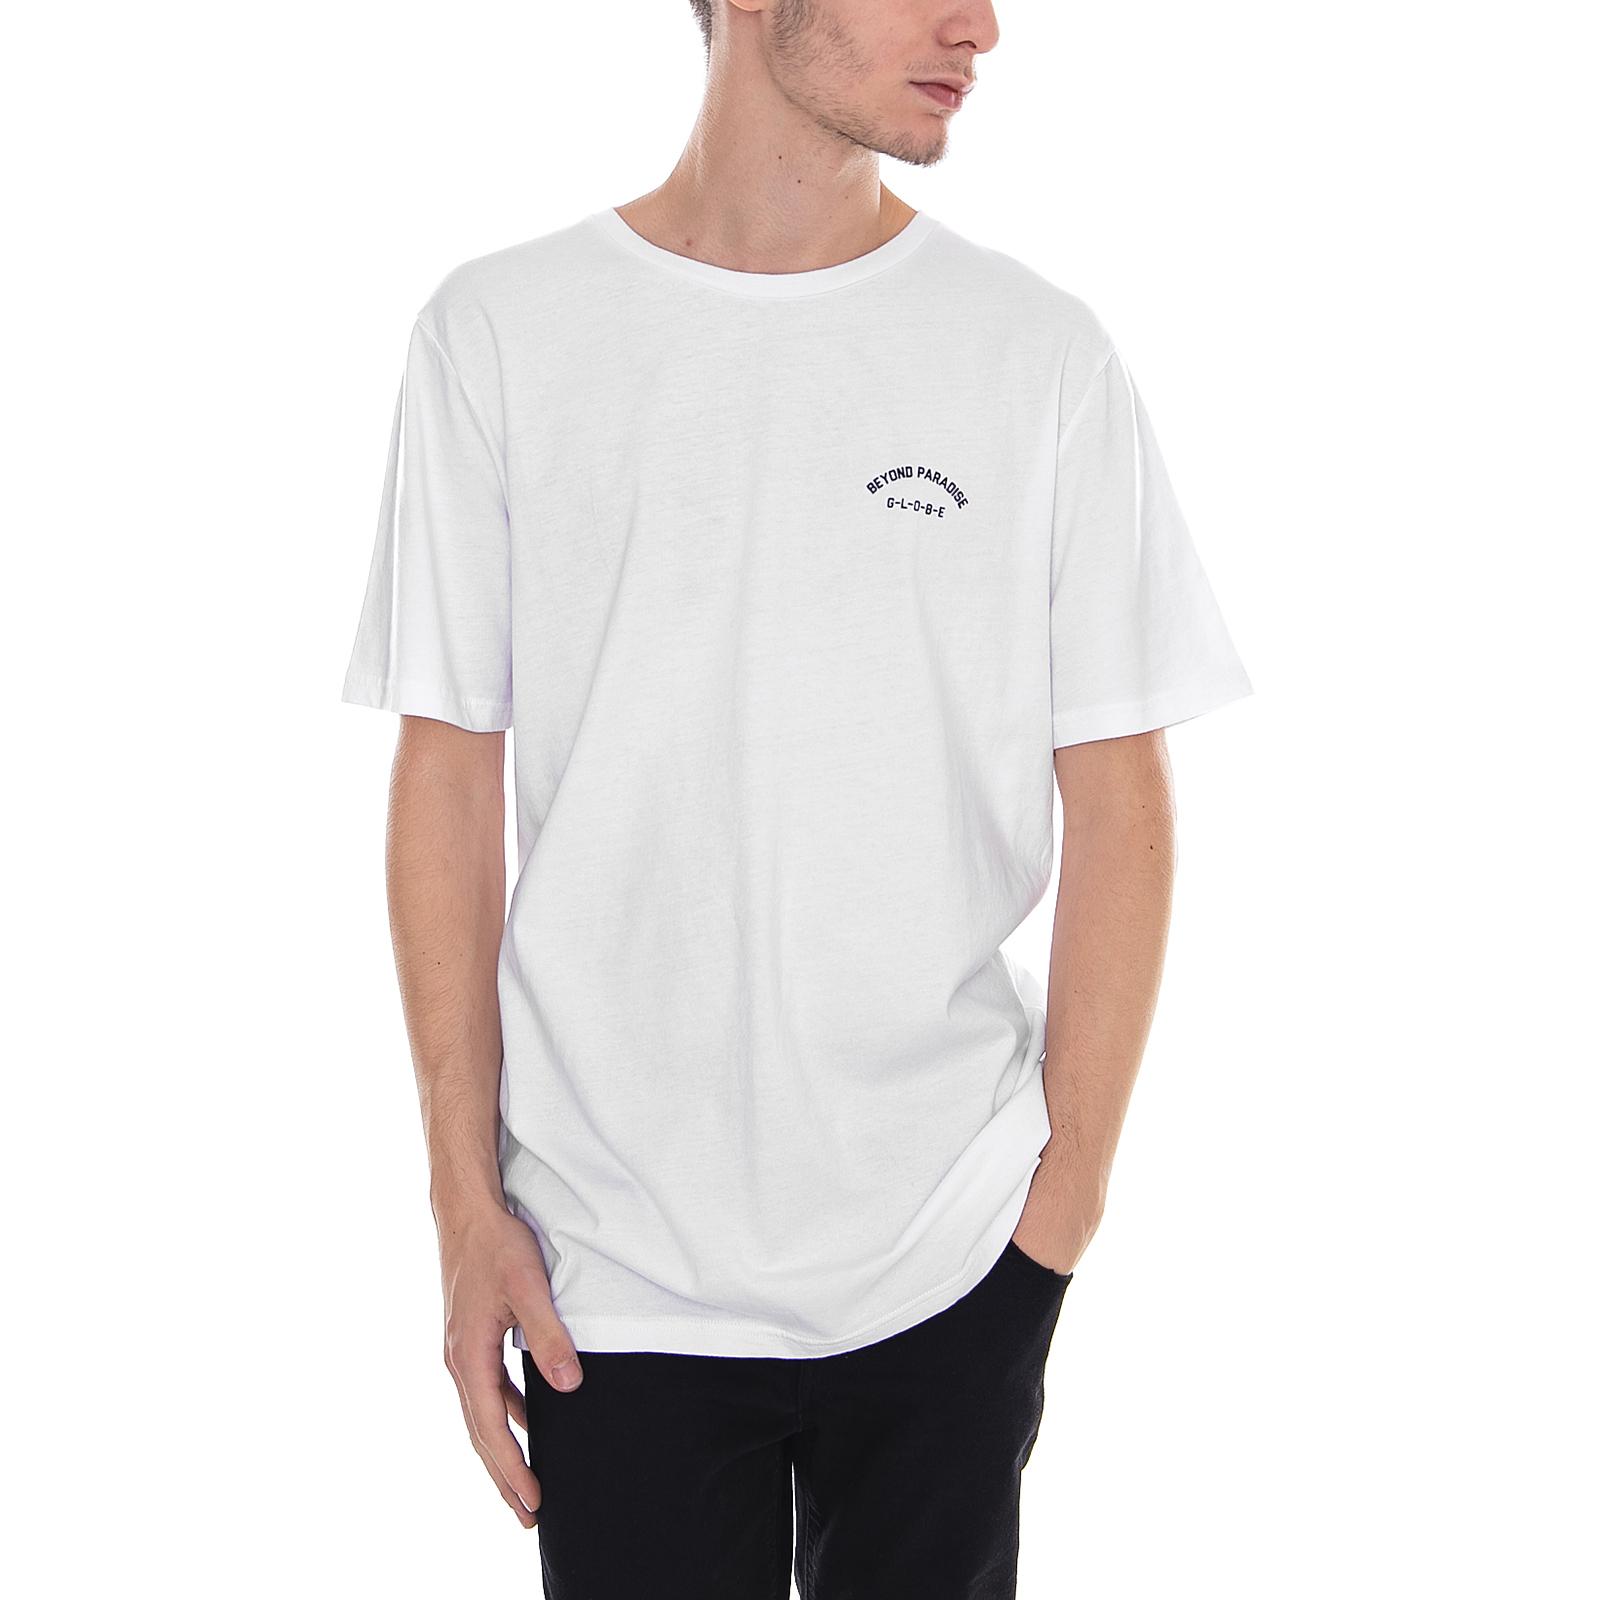 Globe T-Shirt Paradise Tee White White